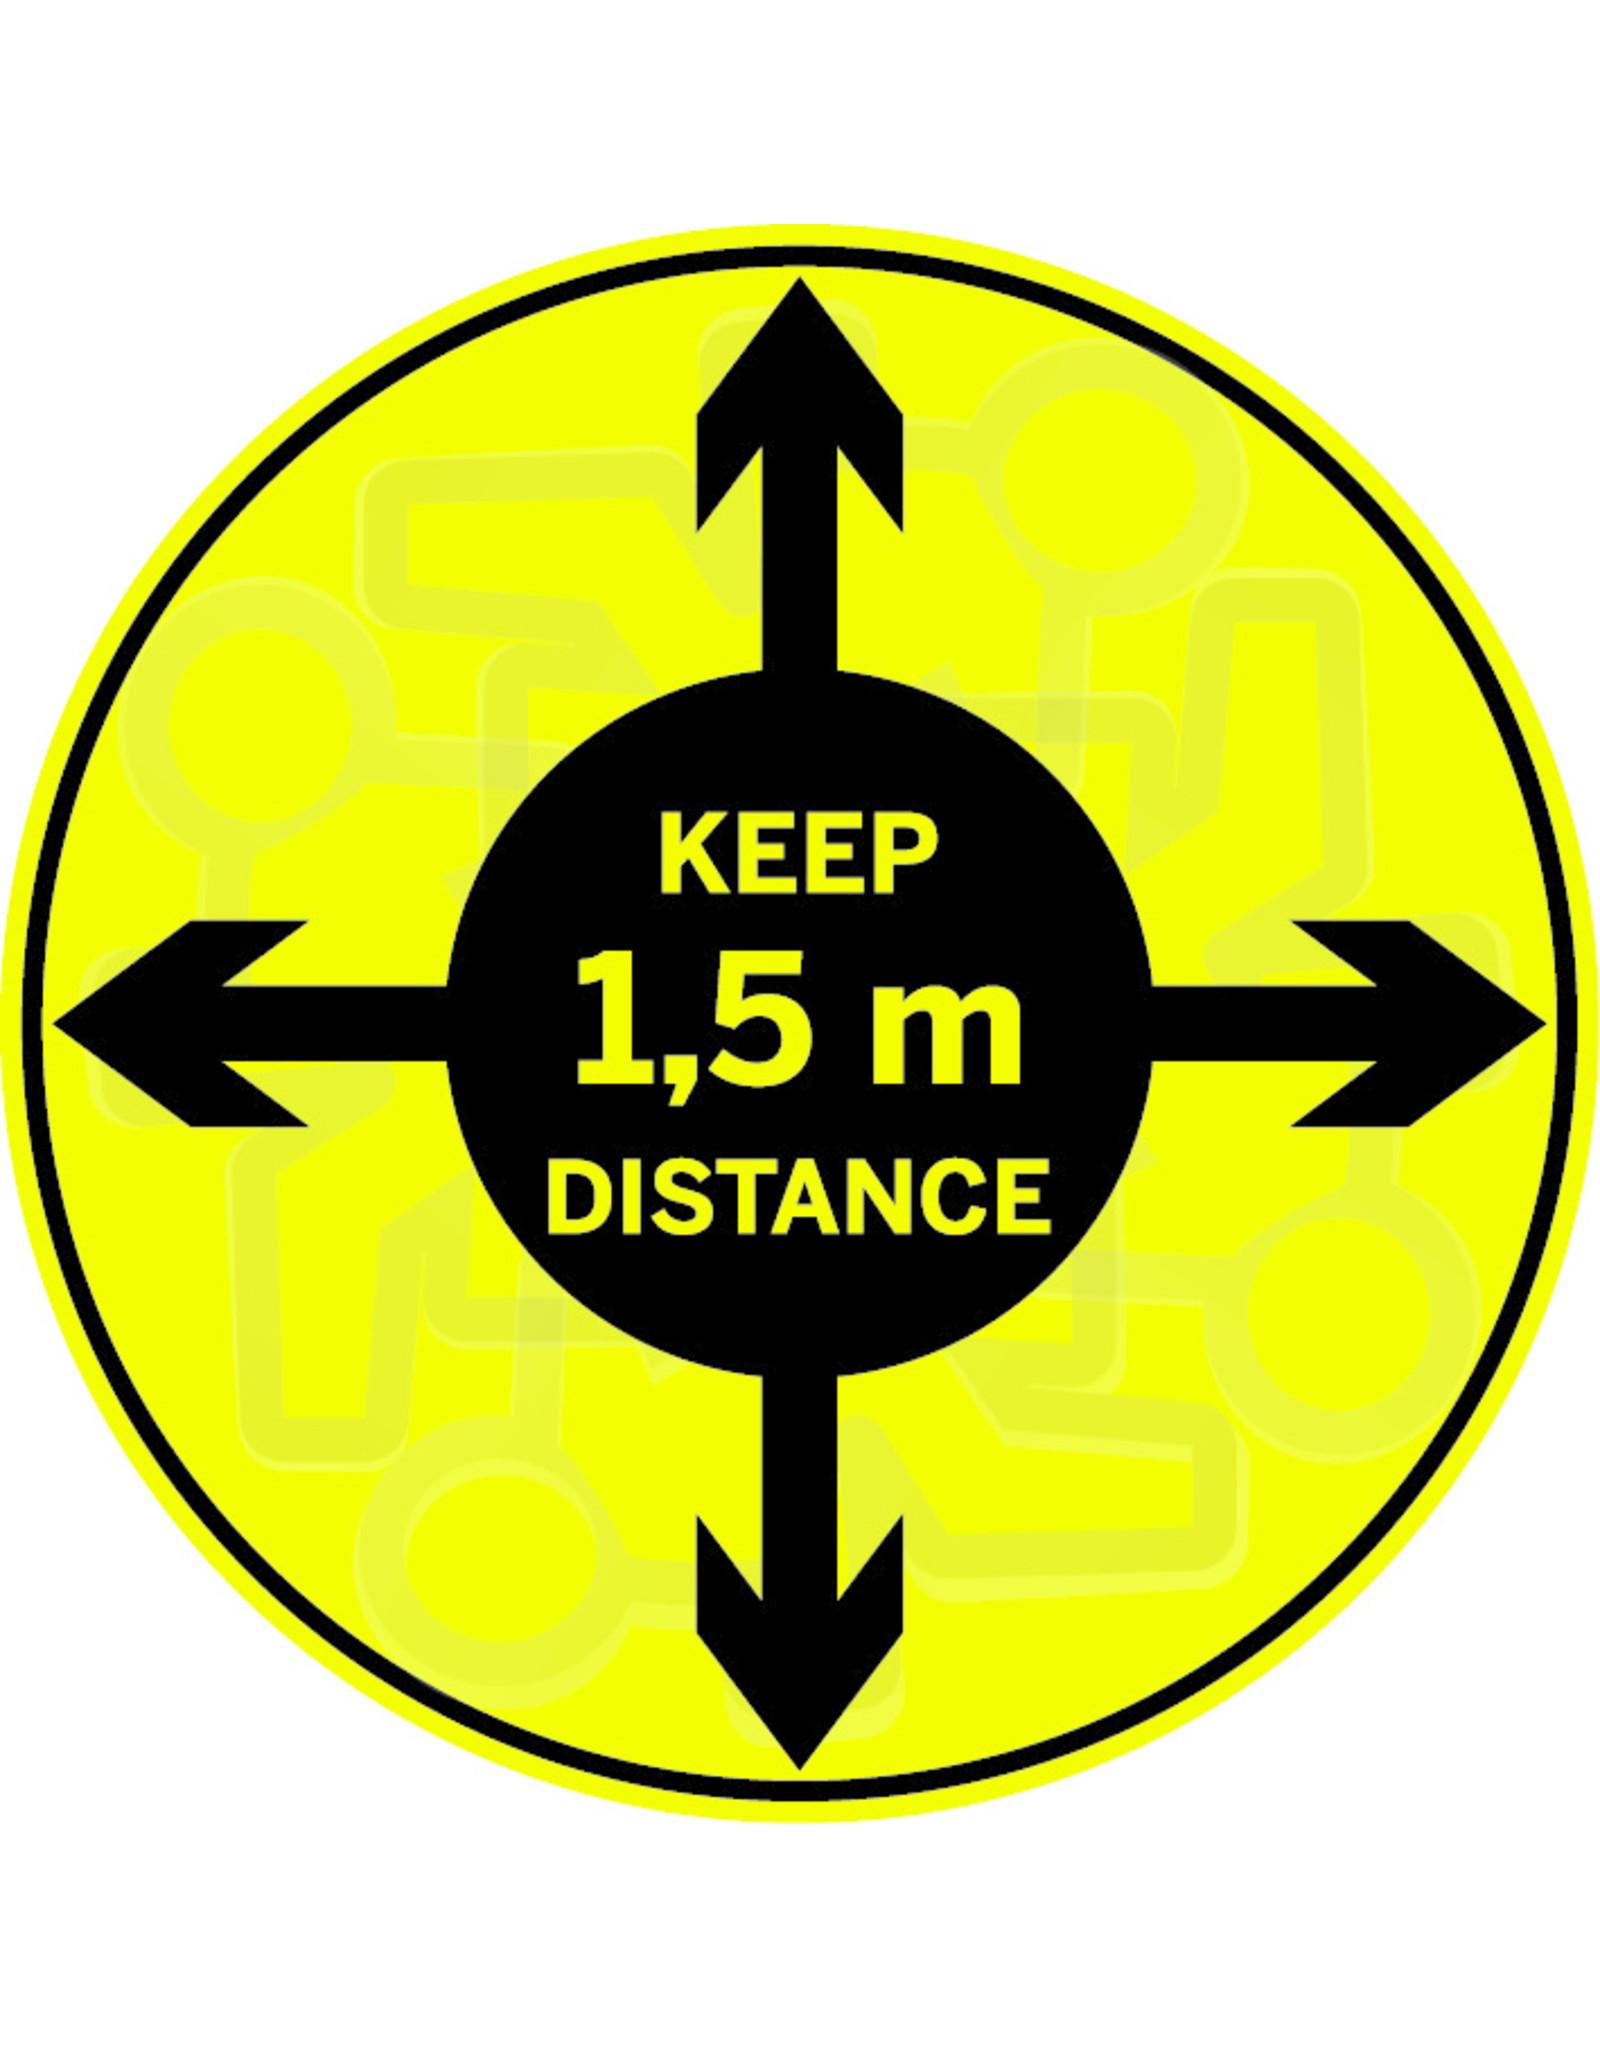 Sticker: keep 1,5 m distance